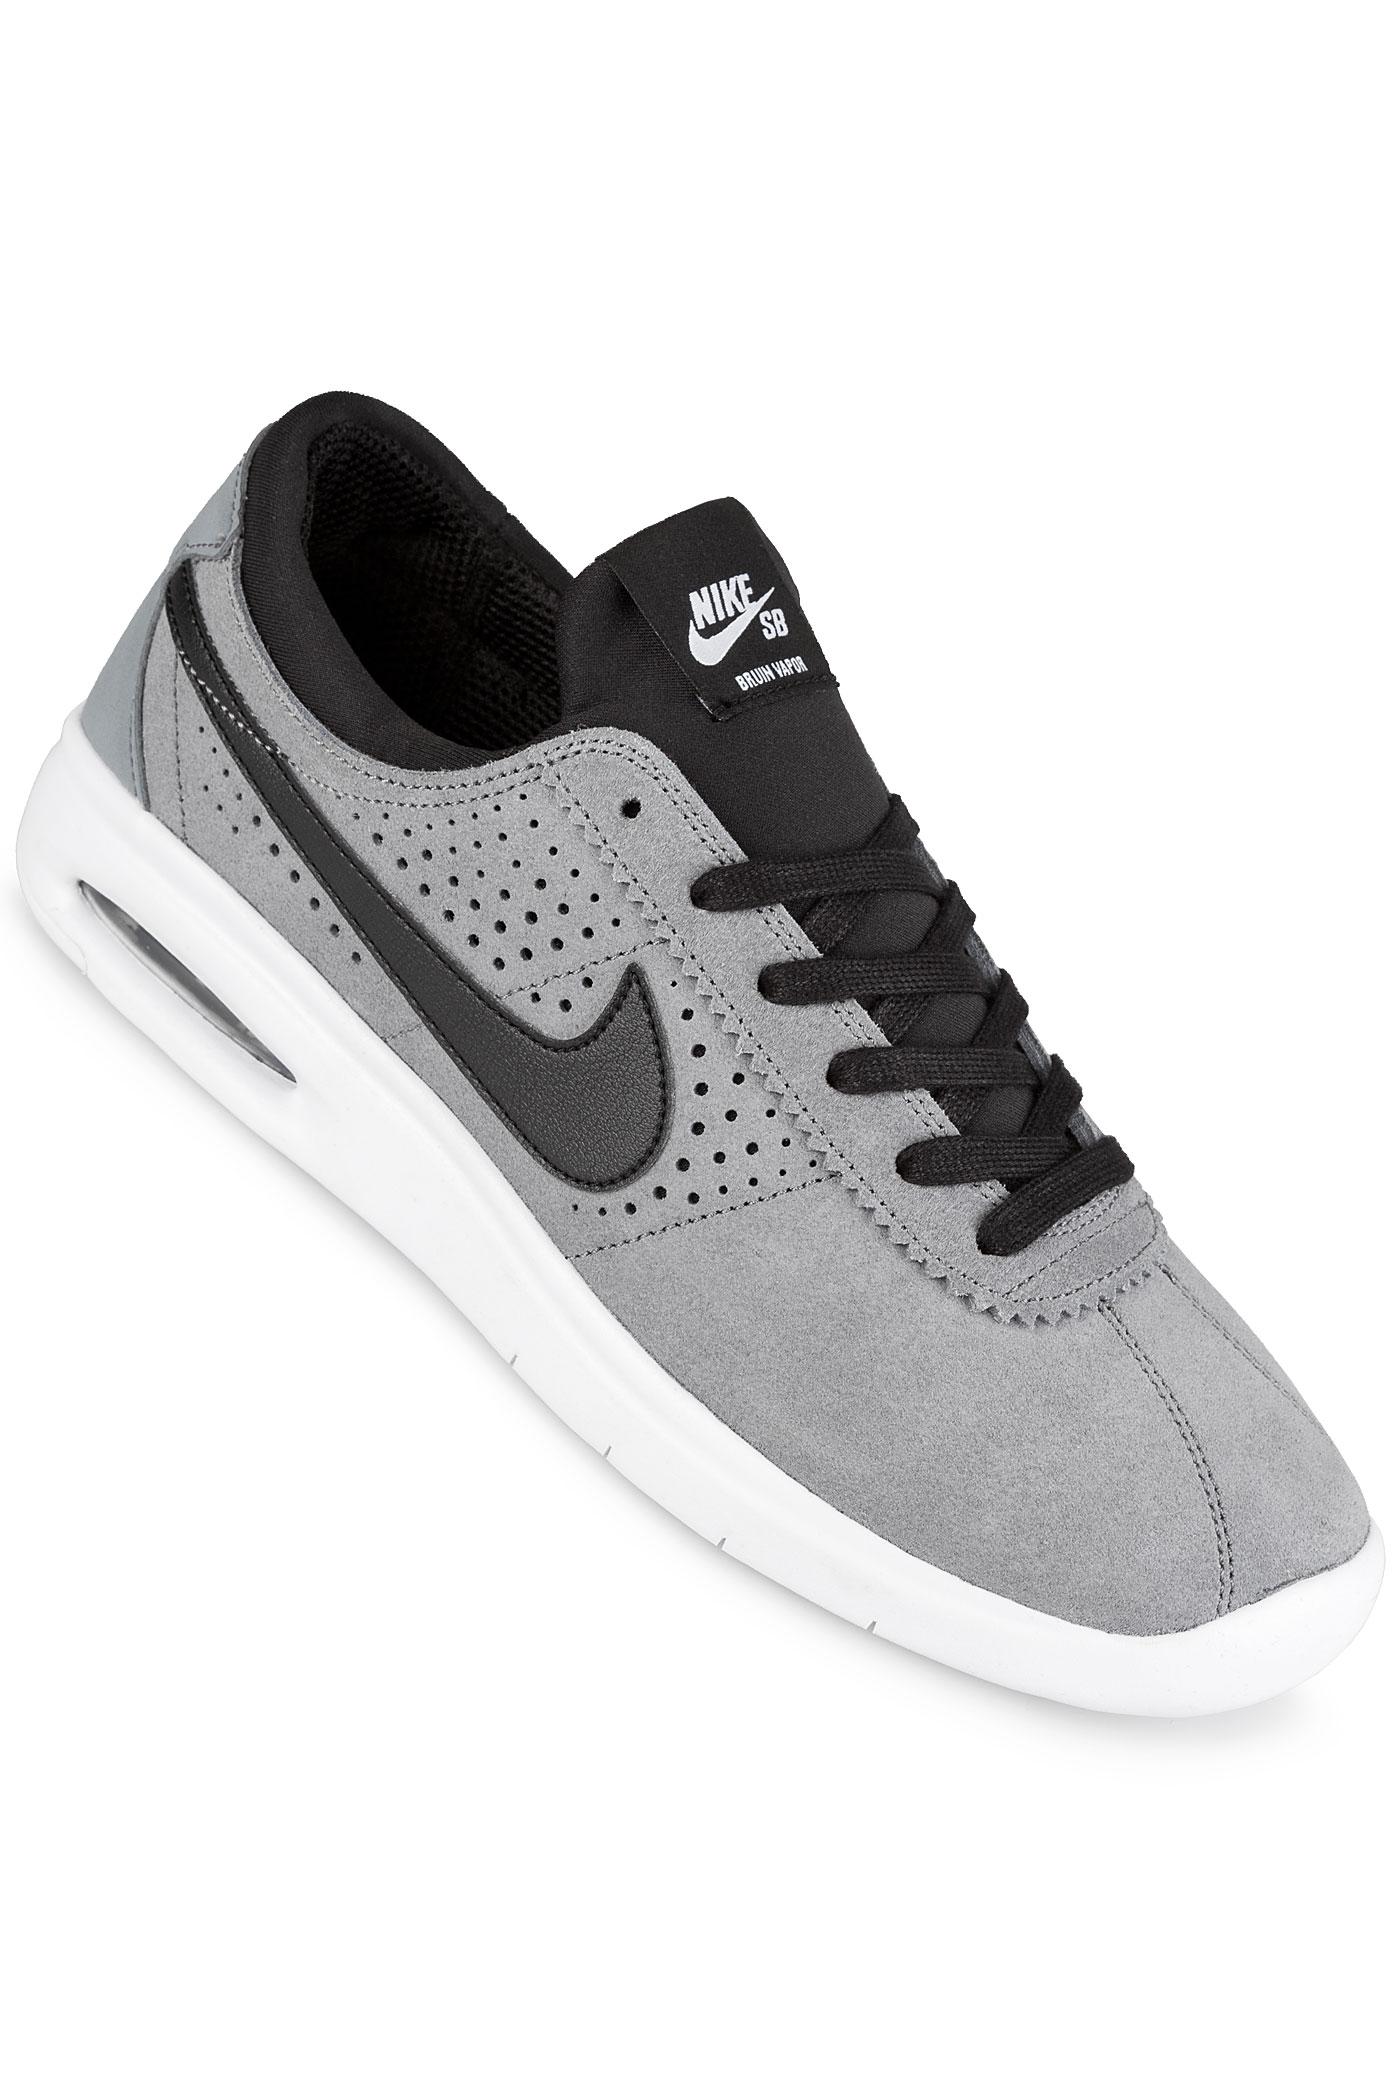 buy online 8b7db b2dc3 Color BlackCool Grey-White Nike SB Air Max Bruin Vapor Shoes (cool grey  black) .